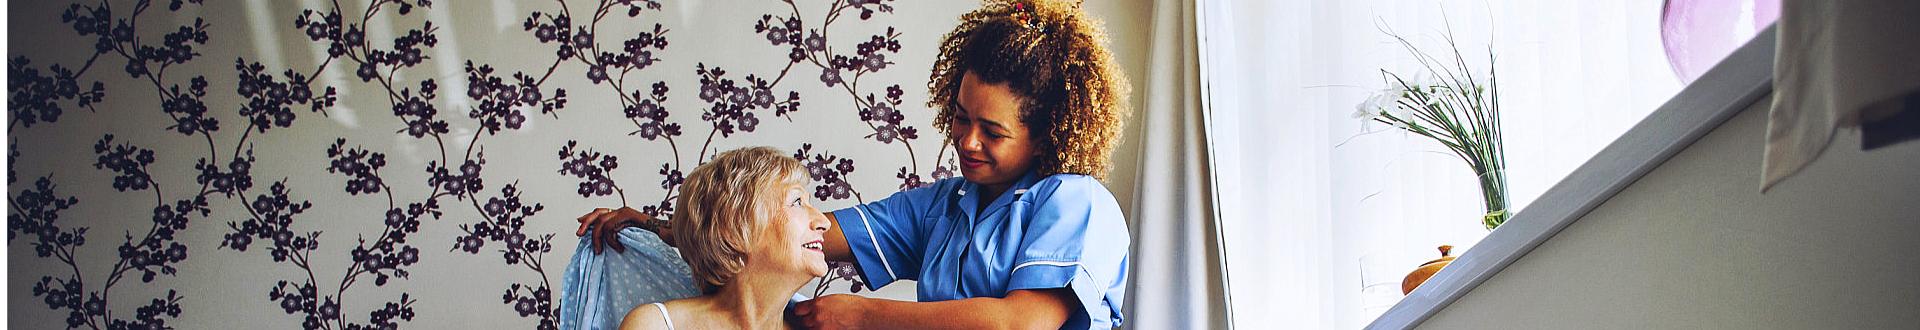 caregiver helping senior woman in dressing